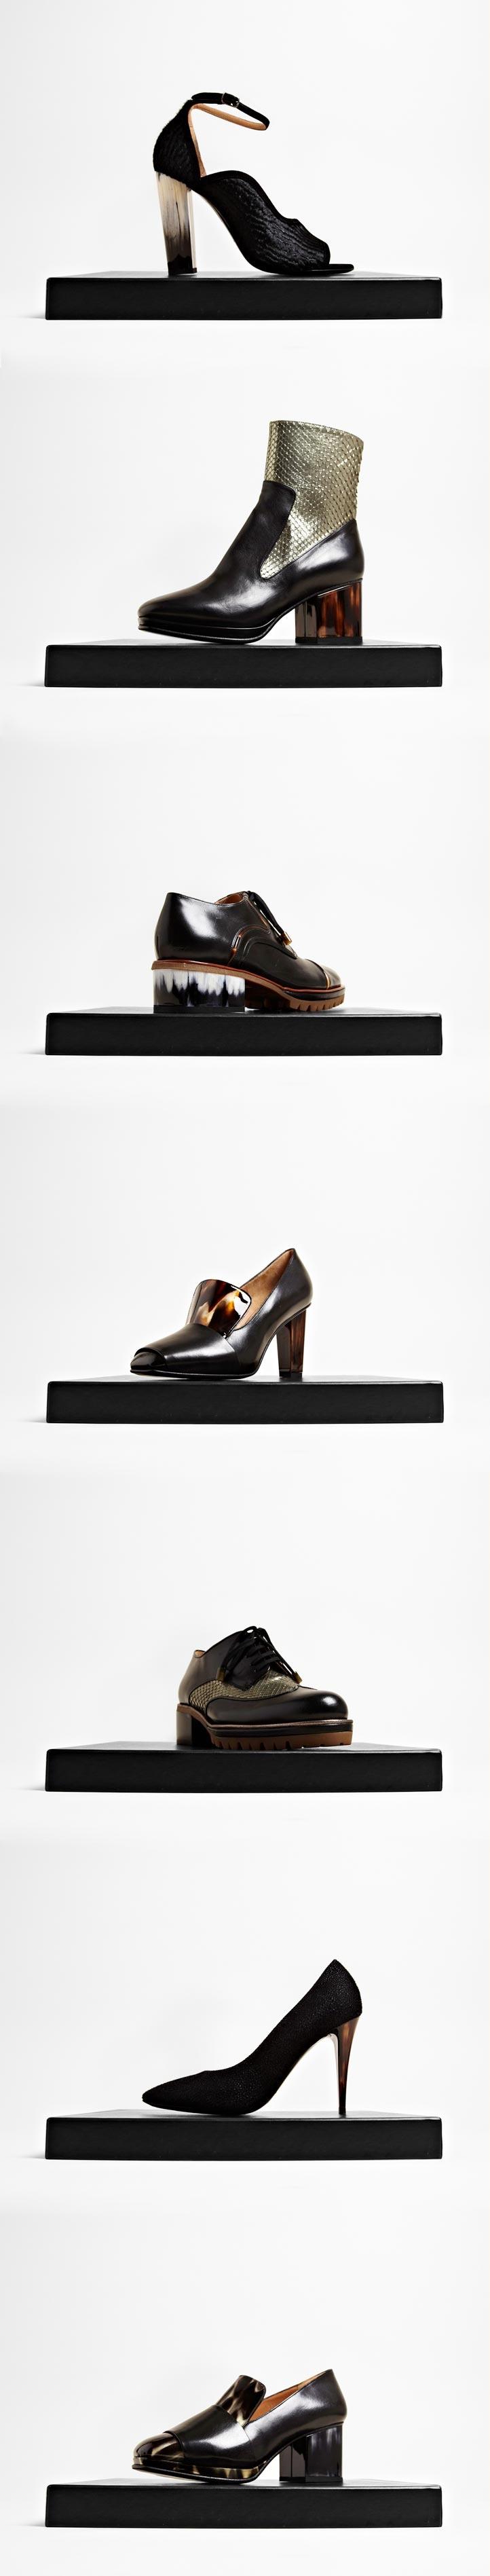 LN-CC WOMEN: DRIES VAN NOTEN FOOTWEAR